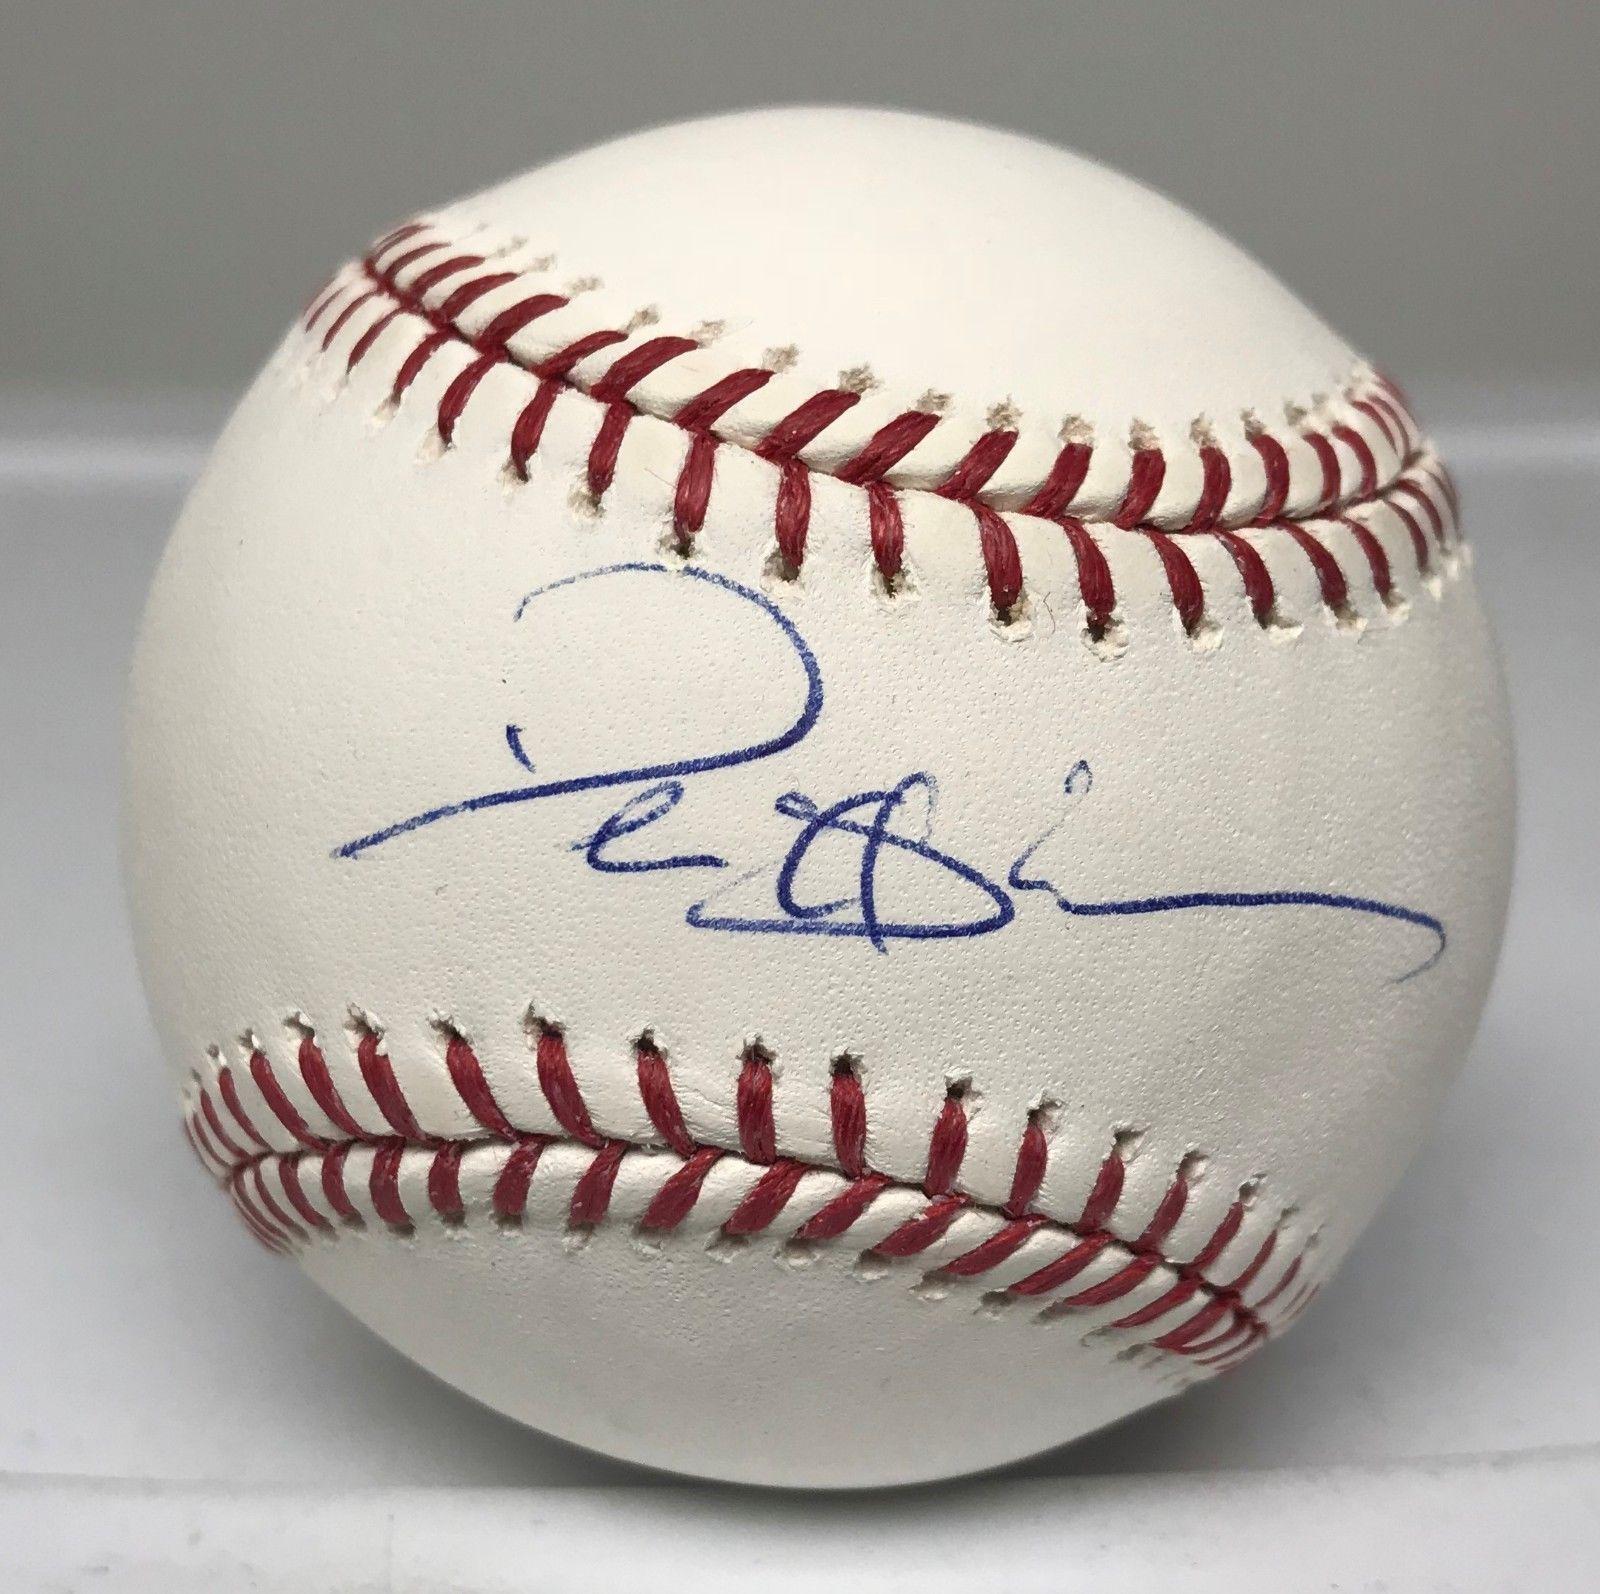 43b42c5af69 Deion Sanders Signed Baseball Autograph JSA WITNESSED COA NFL Falcons 49ers  HOF #Football